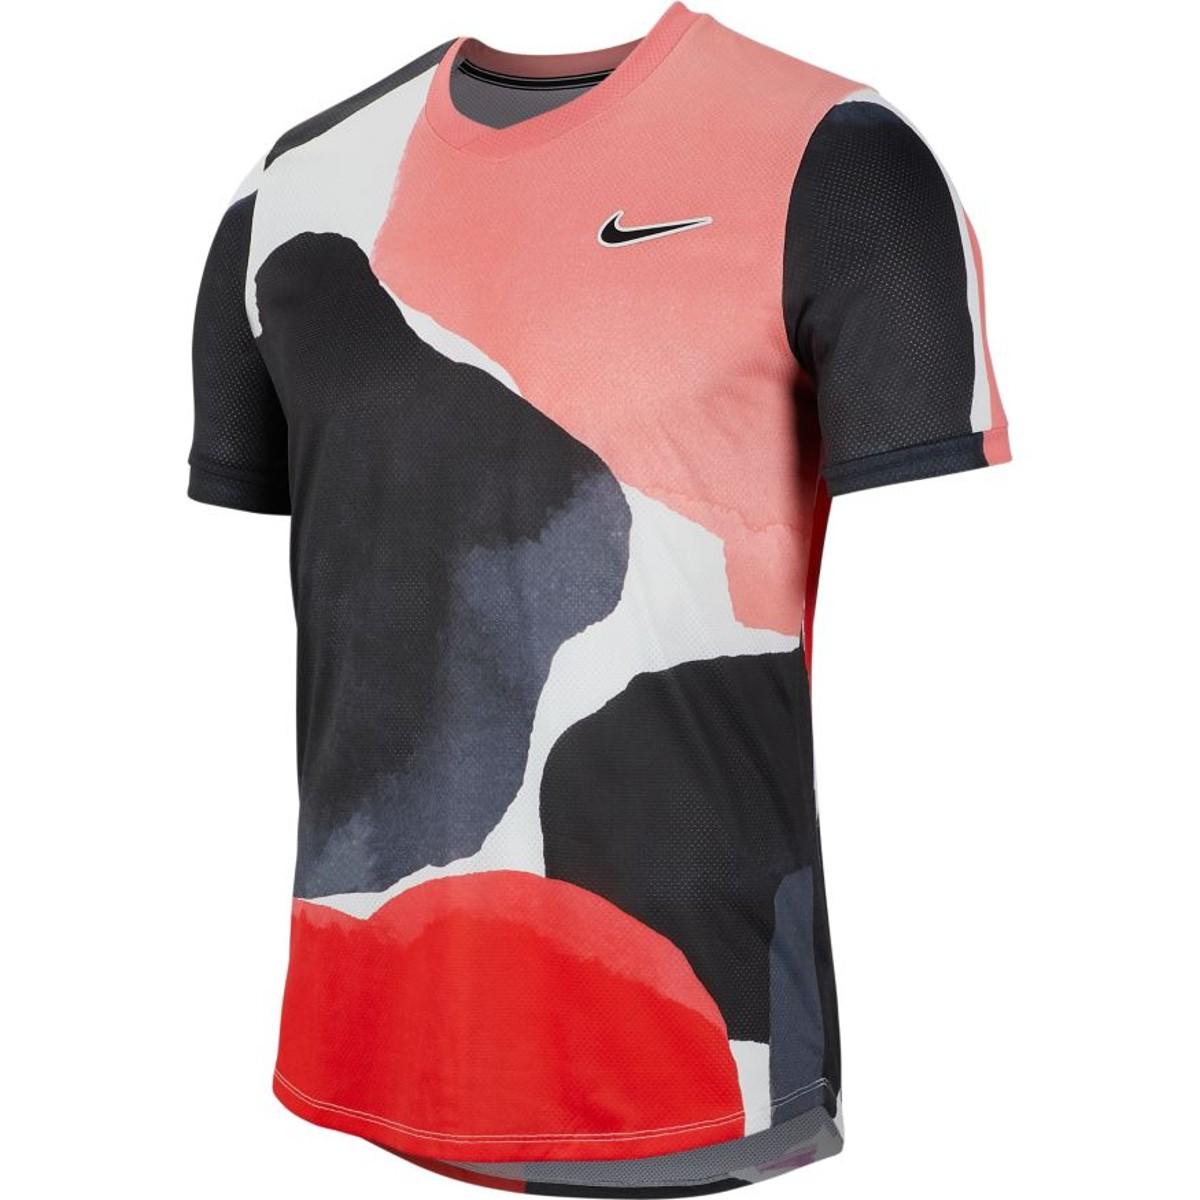 nike athlete t-shirt